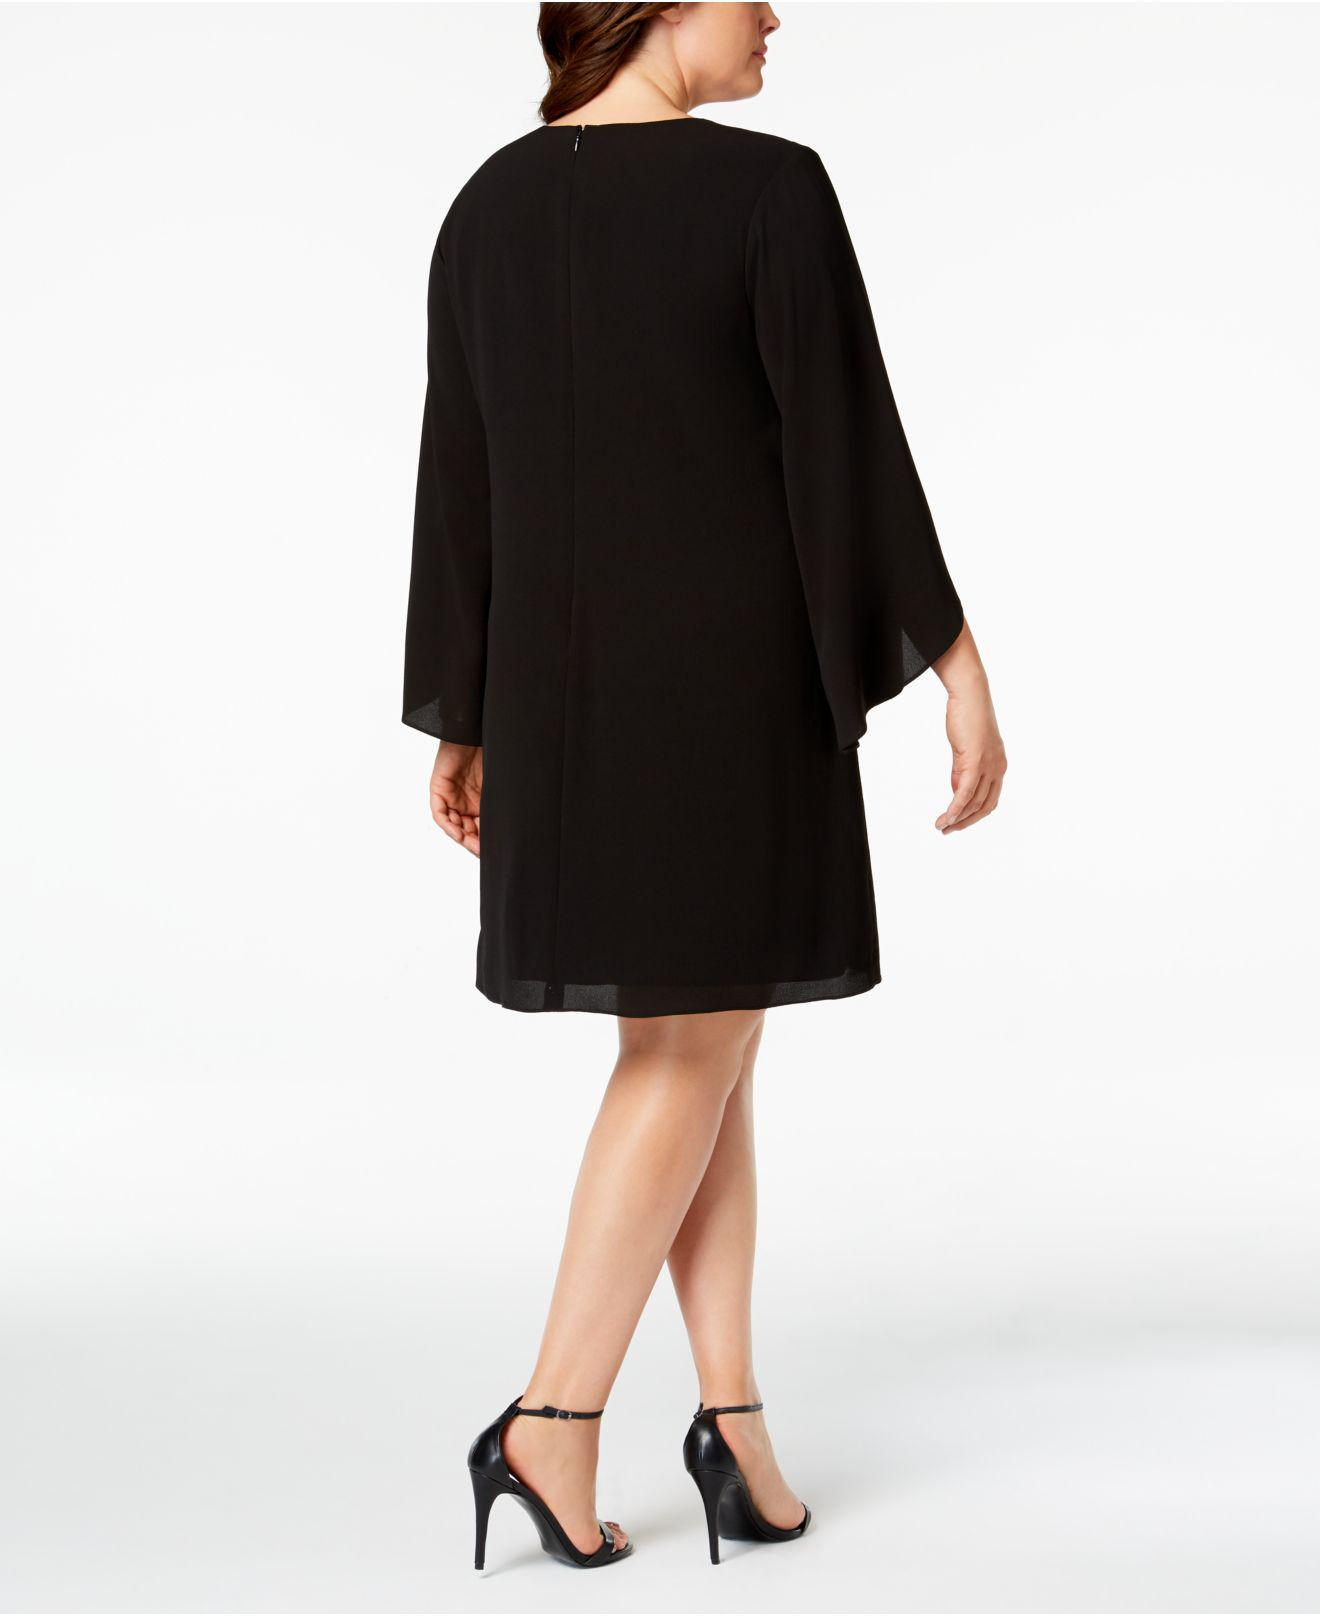 Kensie Synthetic Plus Size Keyhole Shift Dress In Black Lyst